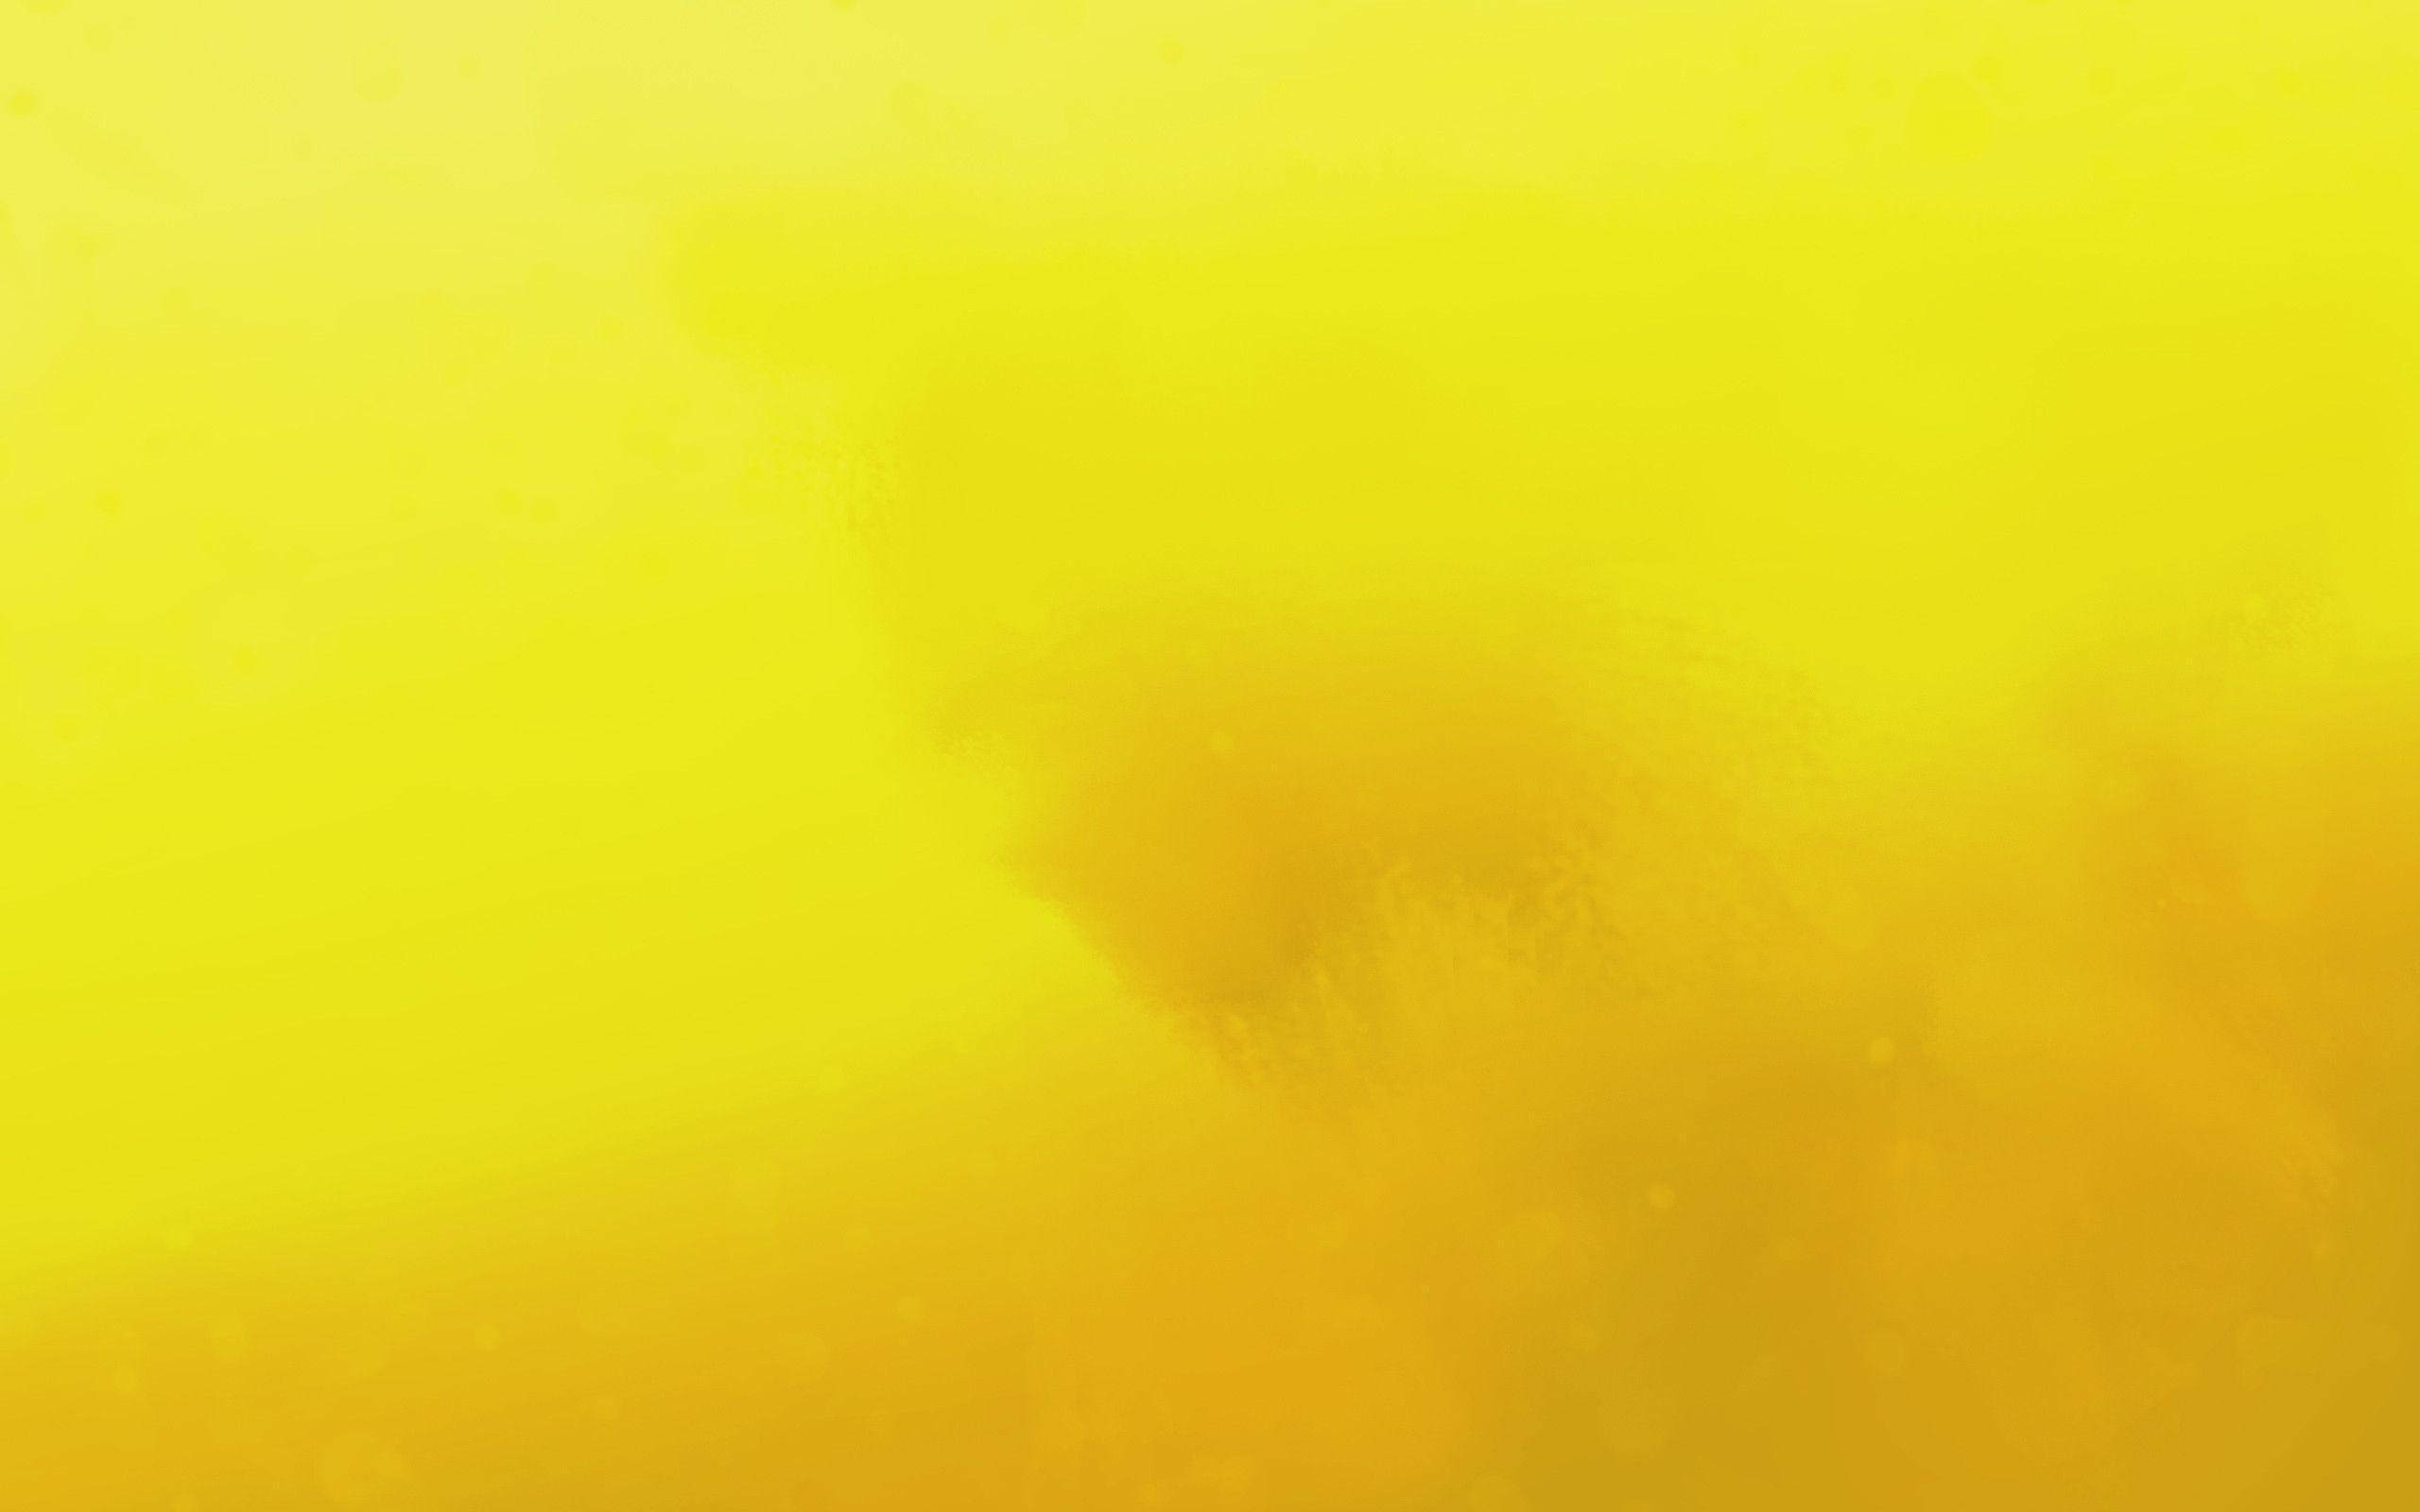 and white wallpaper yellow - photo #36